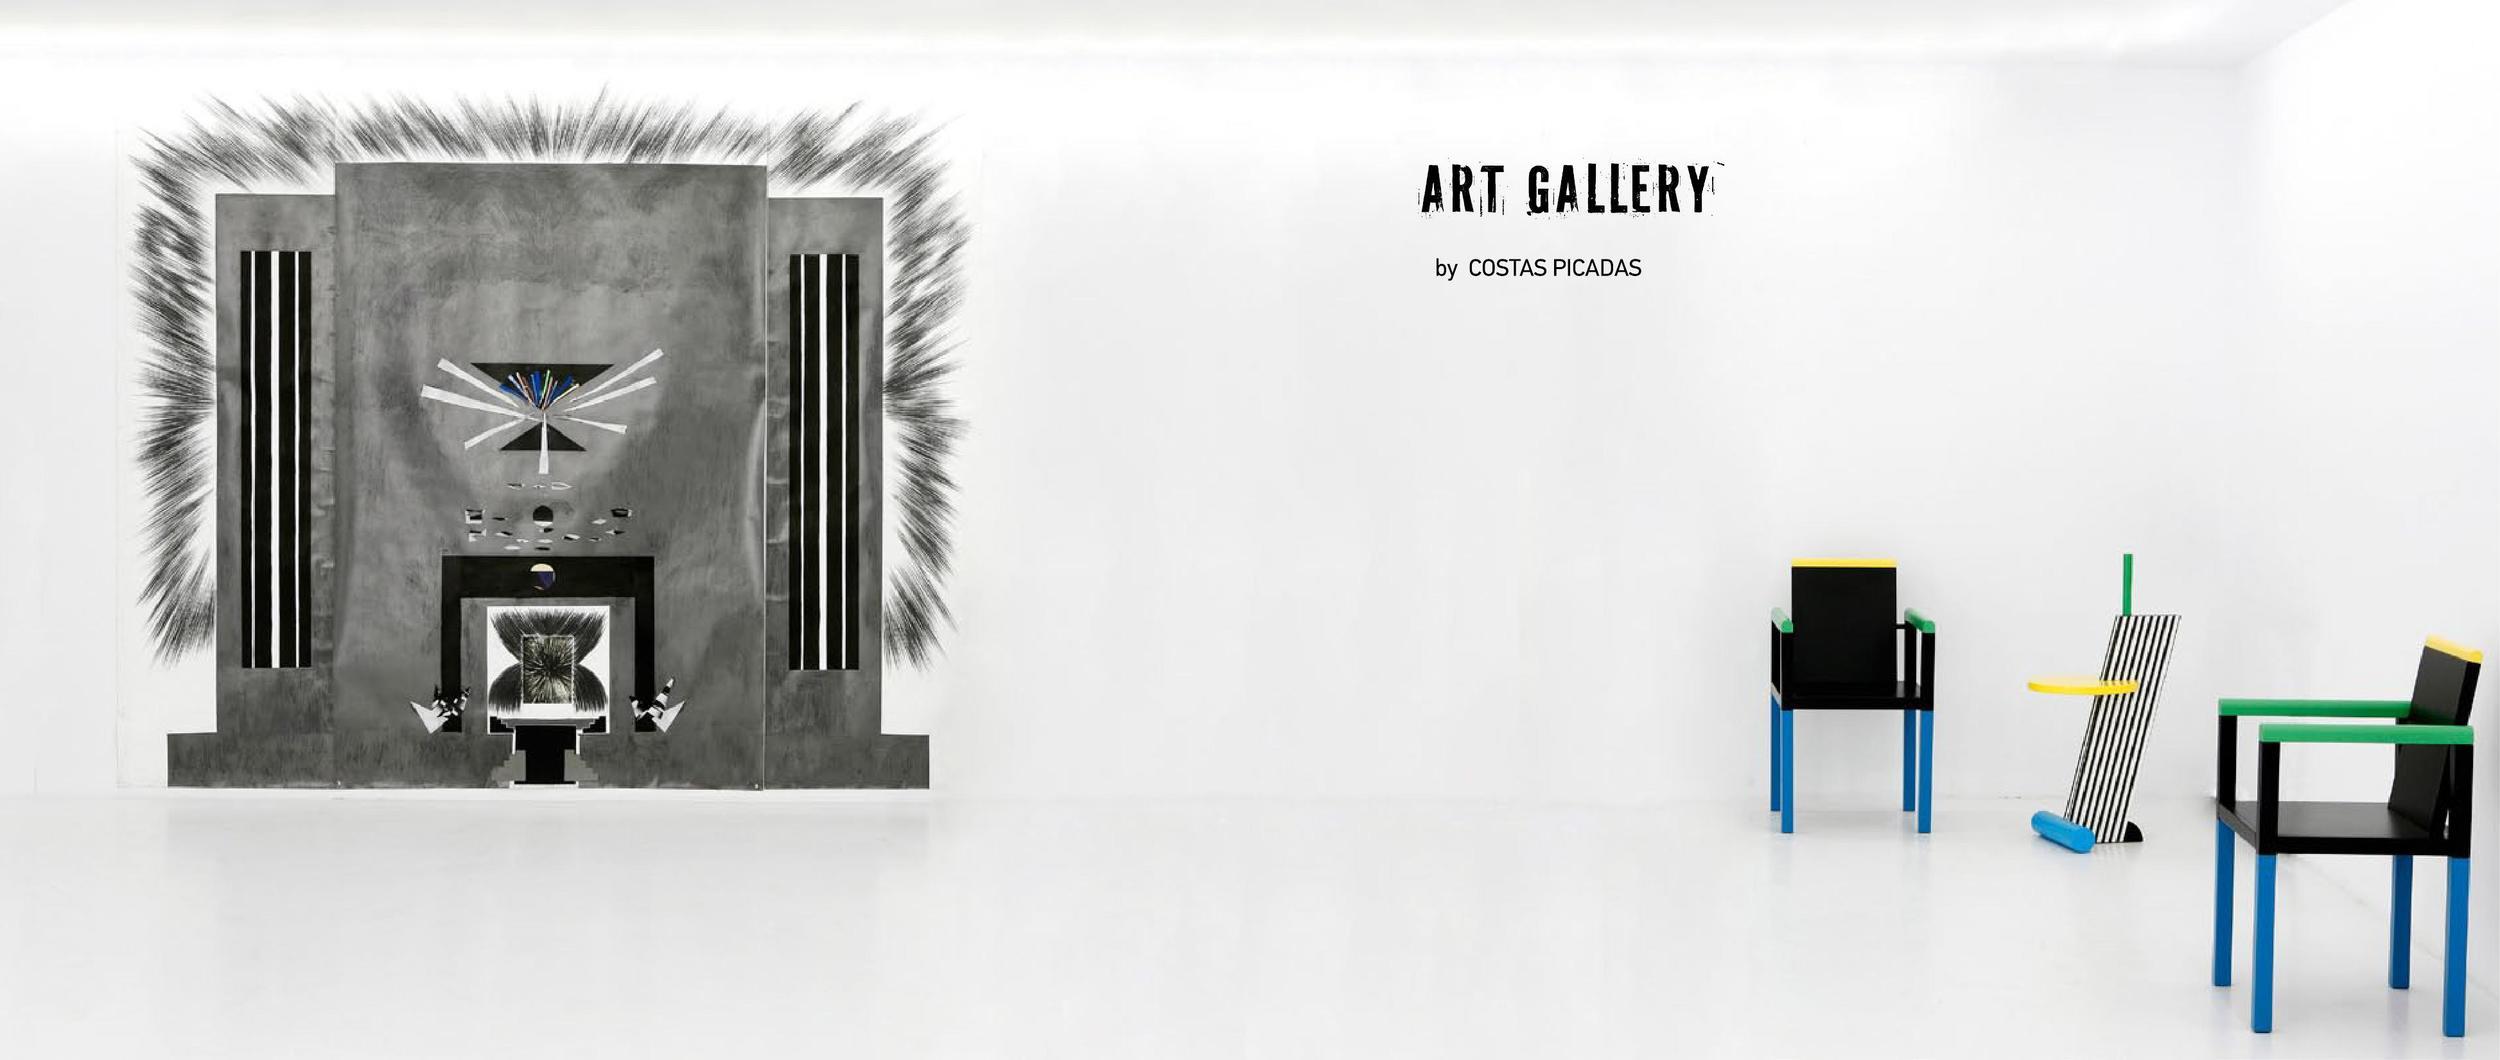 8-ART GALLERY_000001.jpg